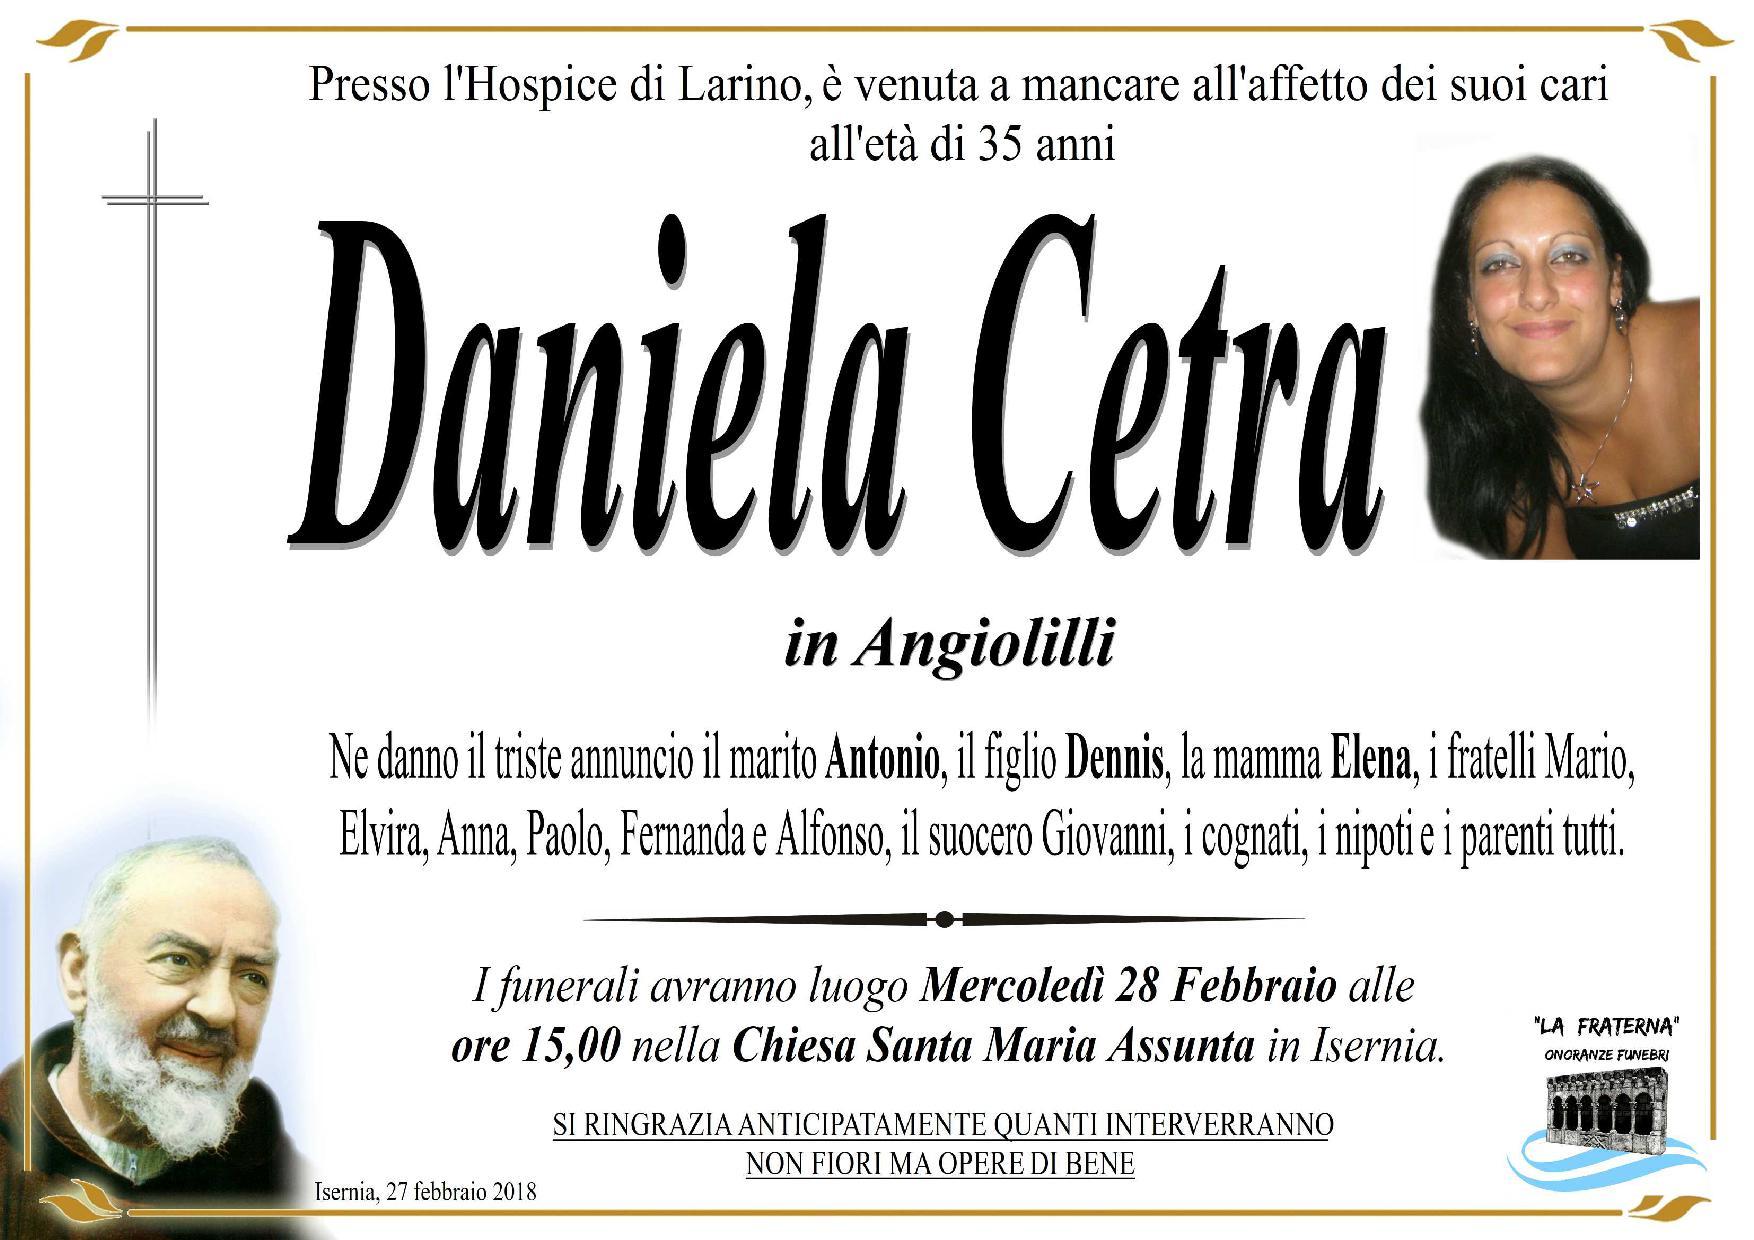 Daniela Cetra – 27/02/2018 – Isernia – Onoranze funebri La Fraterna